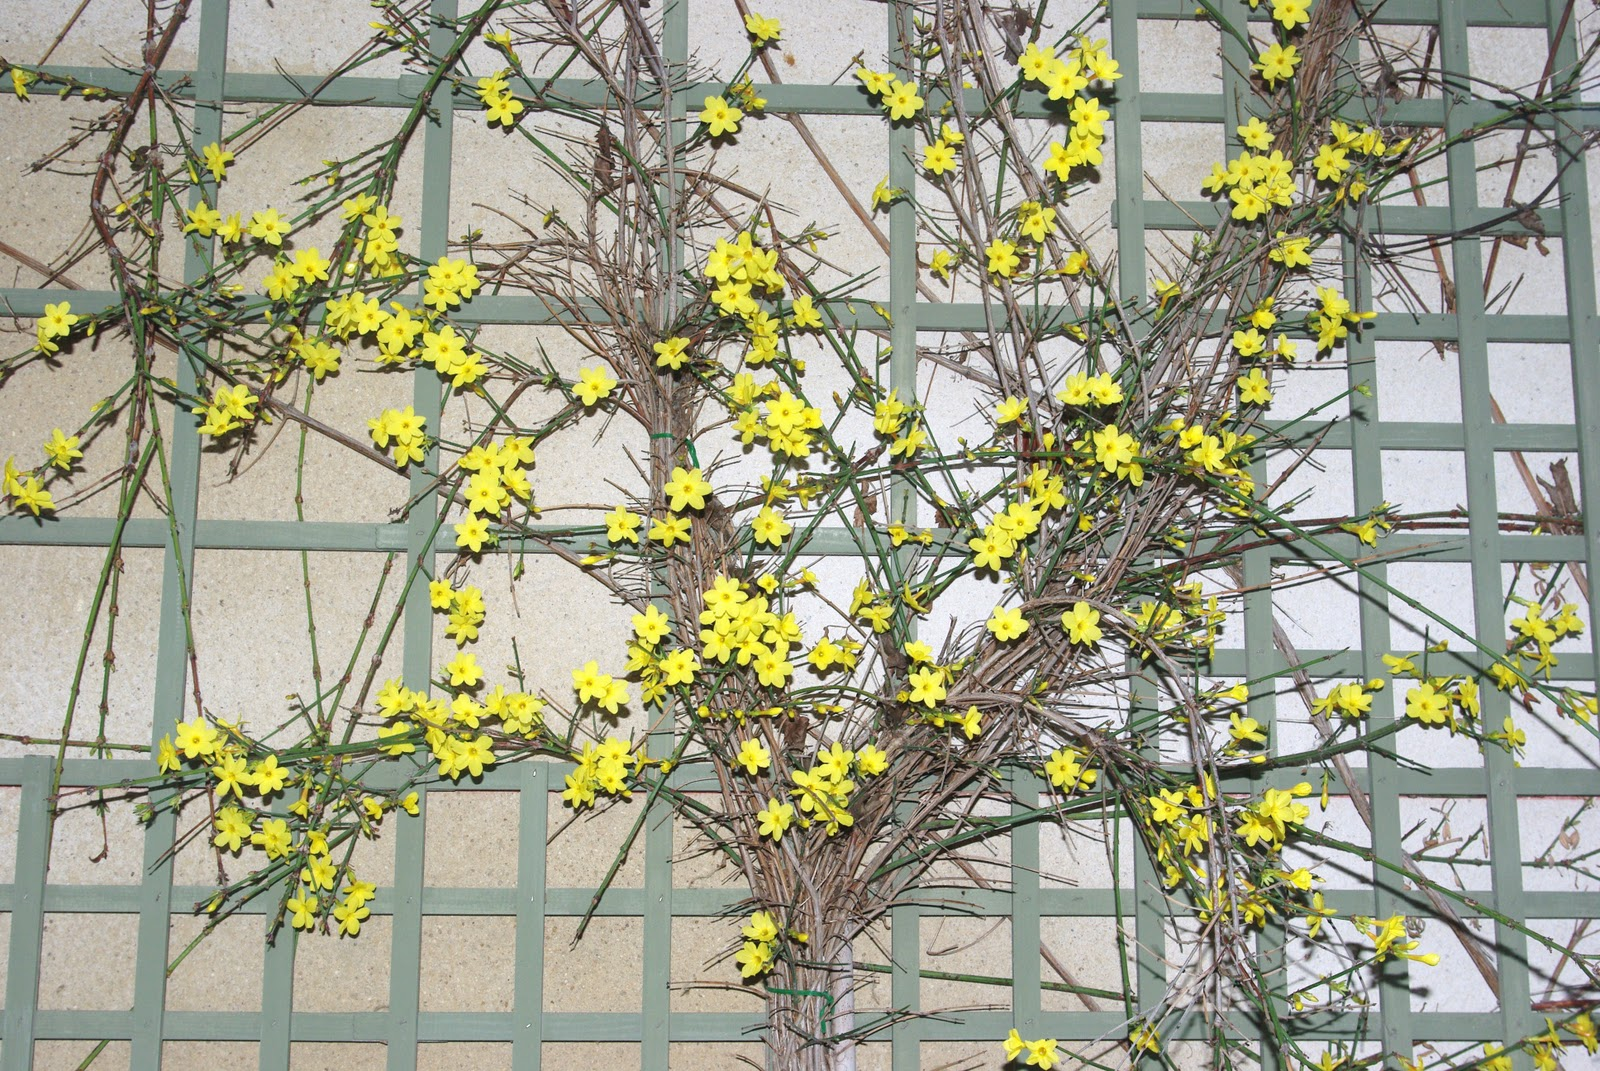 Flore en valois jasmin d 39 hiver jasminum nudiflorum - Jasmin d hiver blanc ...